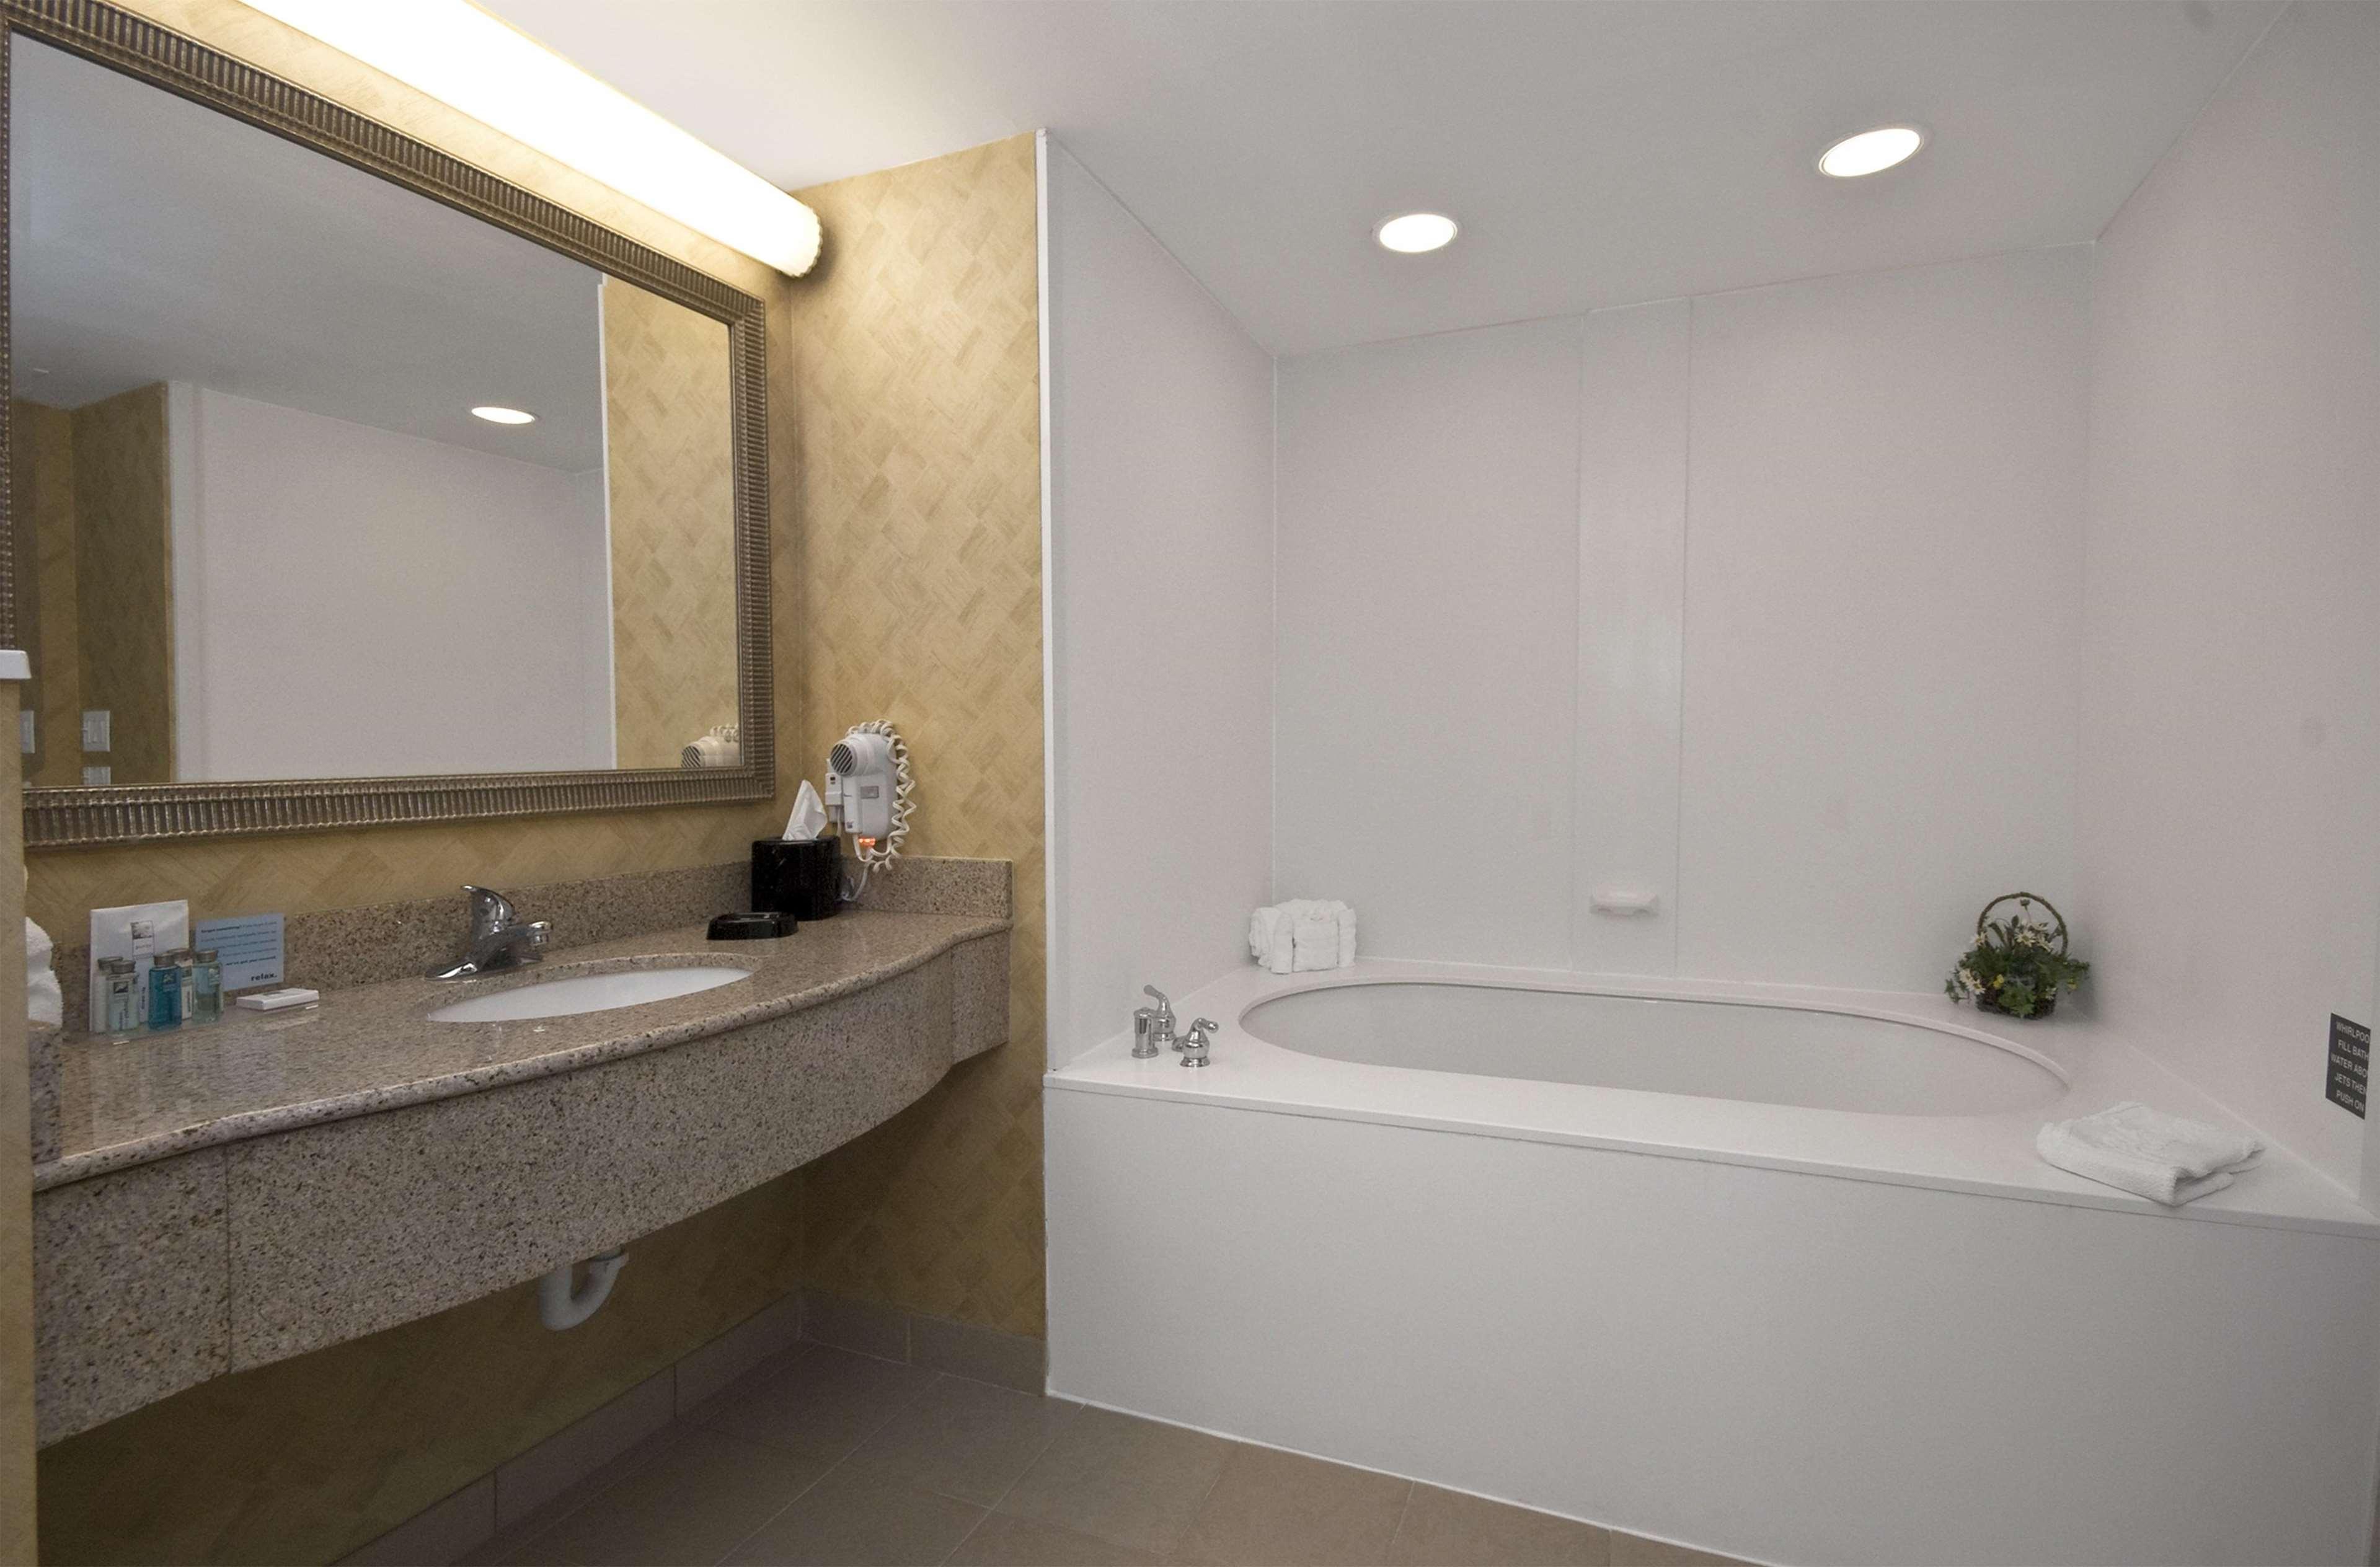 Hampton Inn & Suites Jacksonville South-St. Johns Town Center Area image 39